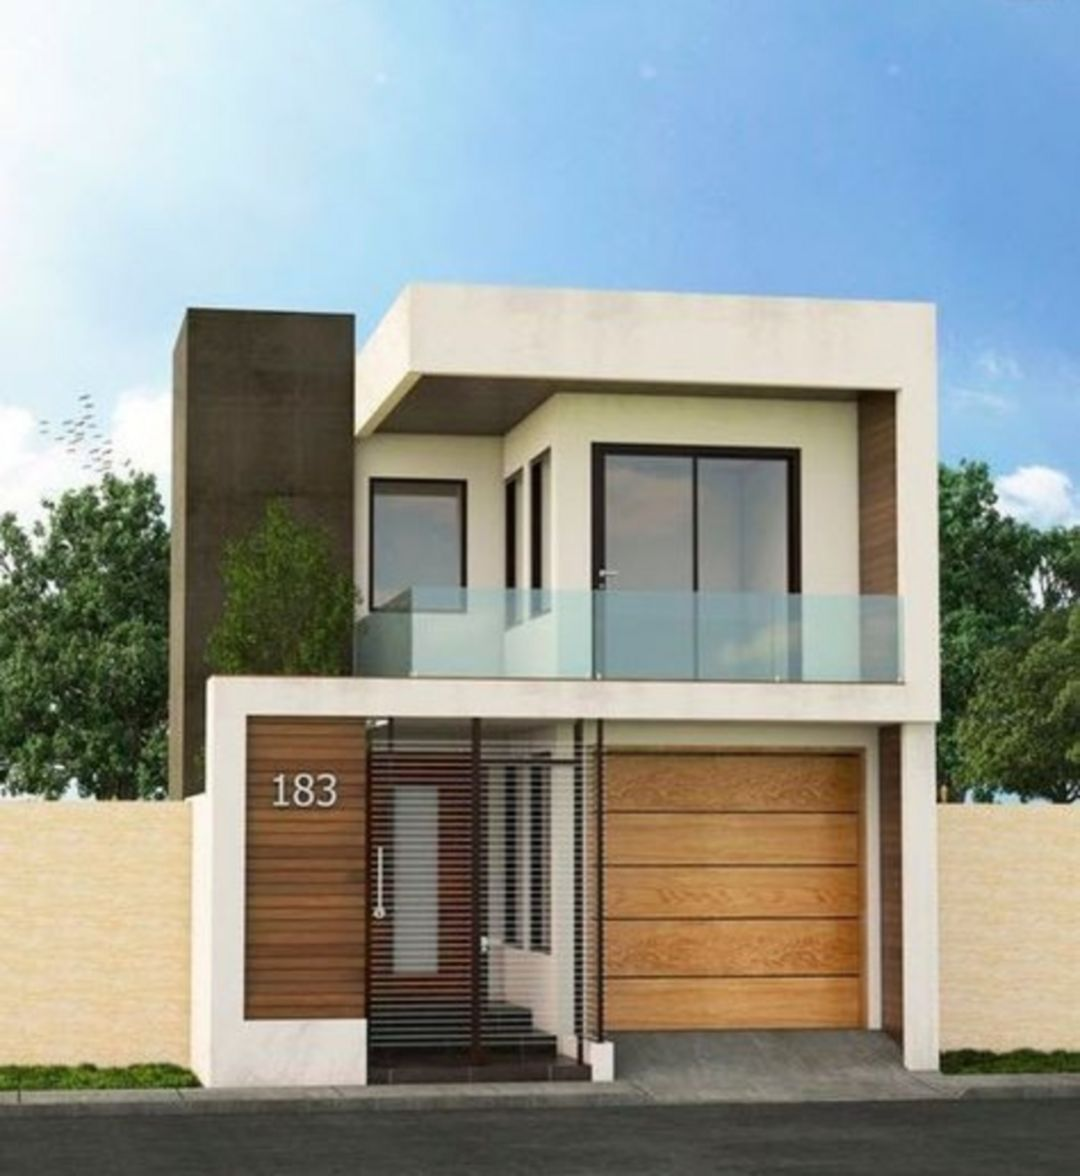 13 Modern Minimalist Tiny House Design Ideas For Your Convenience Facade House Modern Small House Design Minimalist House Design